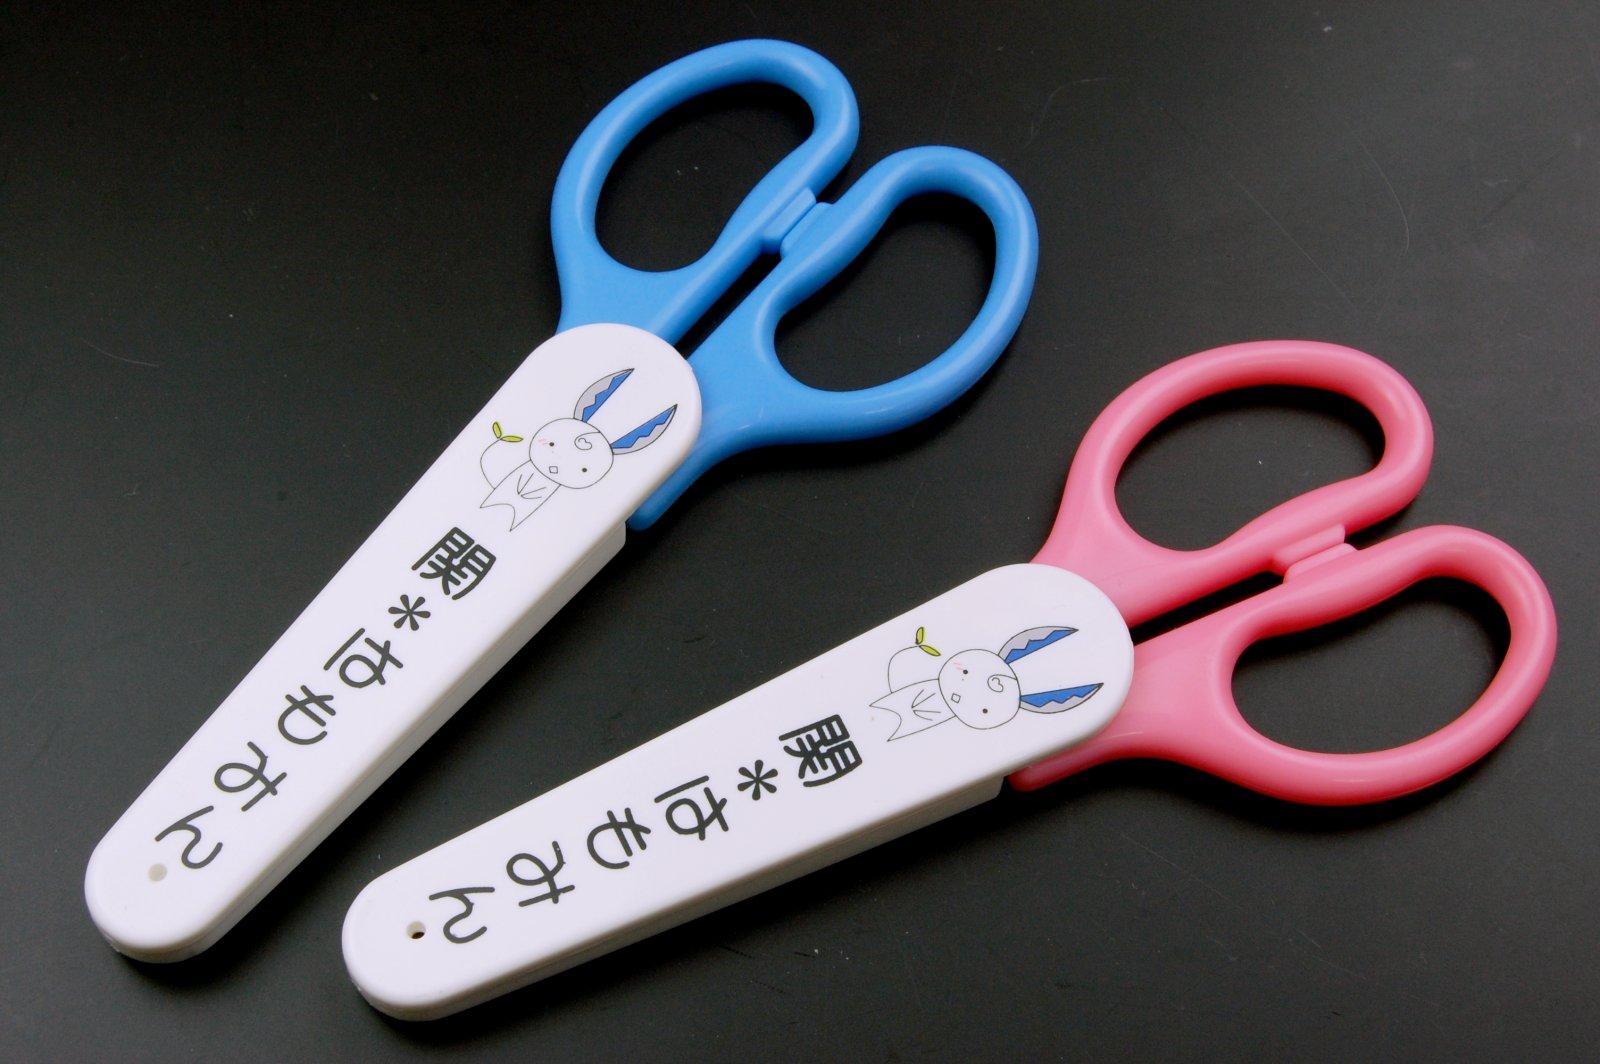 Cap-type scissors 135mm (V5-135C-HAMO) for the はもみん infant